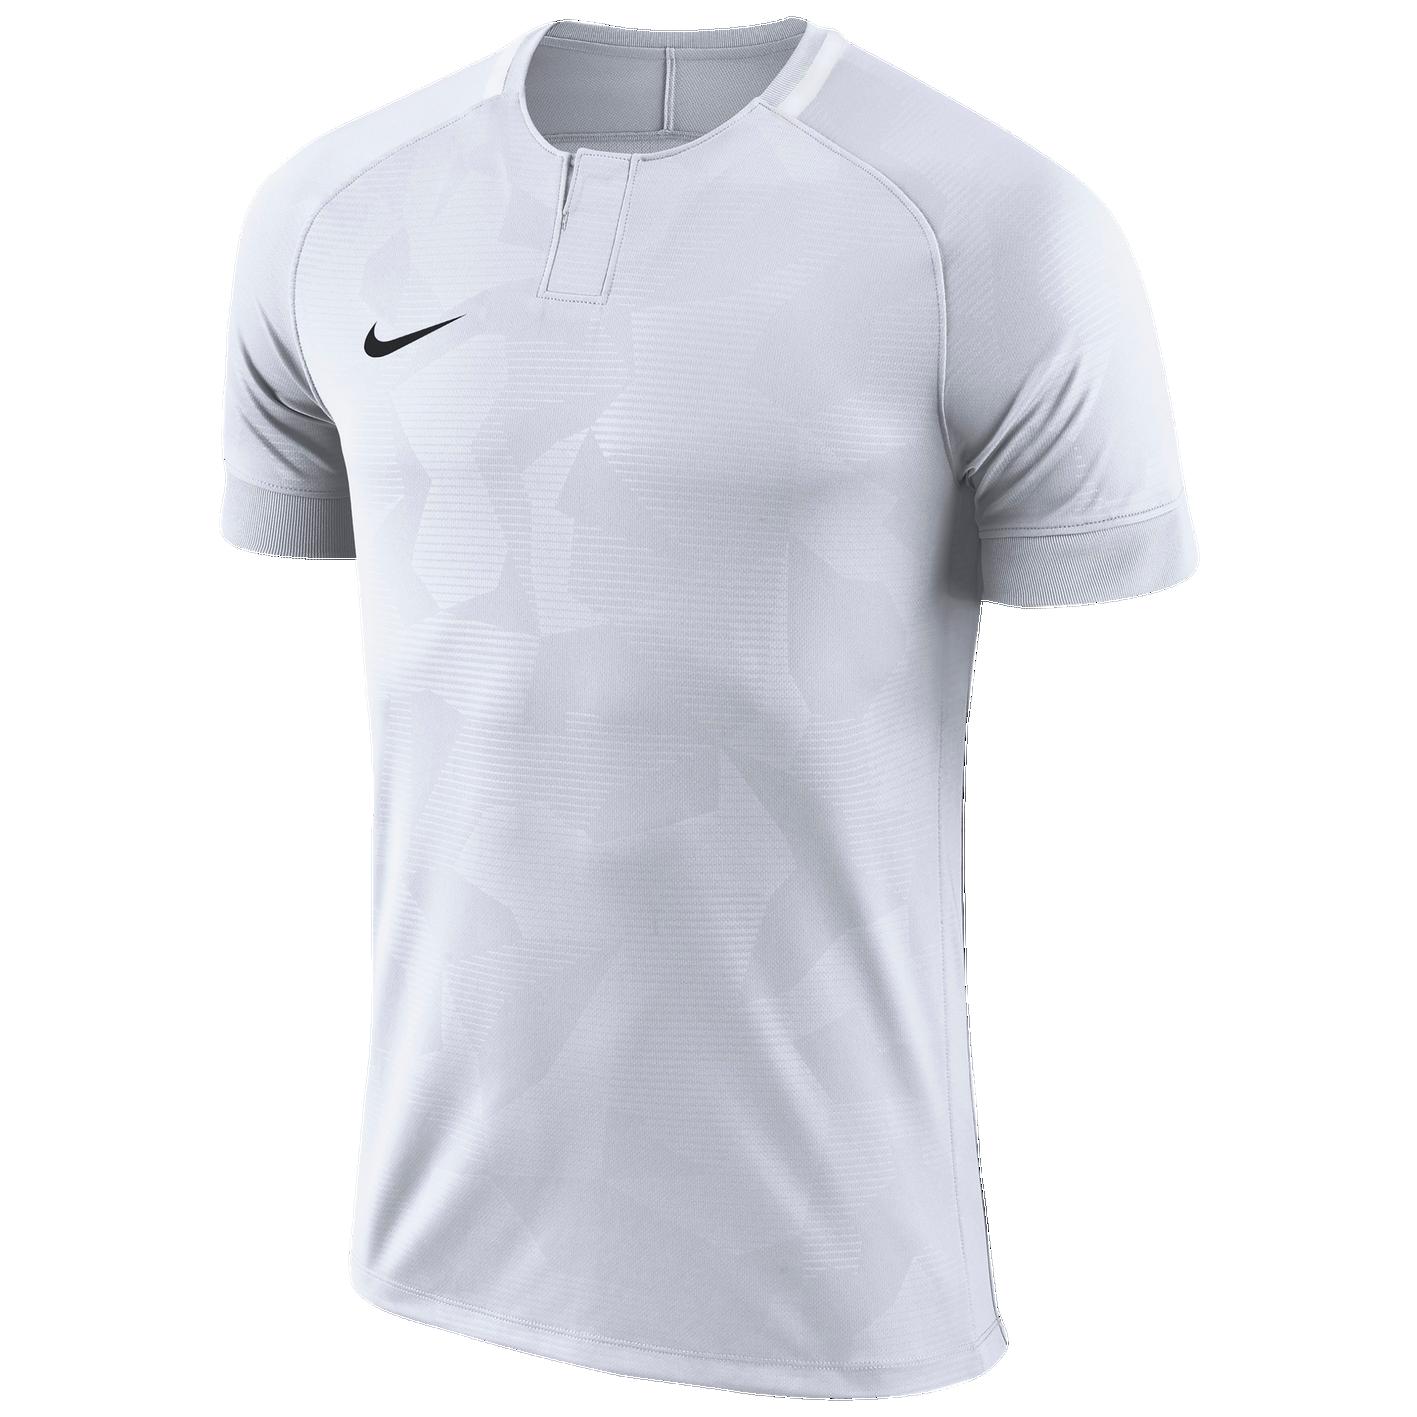 1766ef4a7c0 Nike Team Dry Challenge II Jersey - Grade School - Soccer - Clothing ...